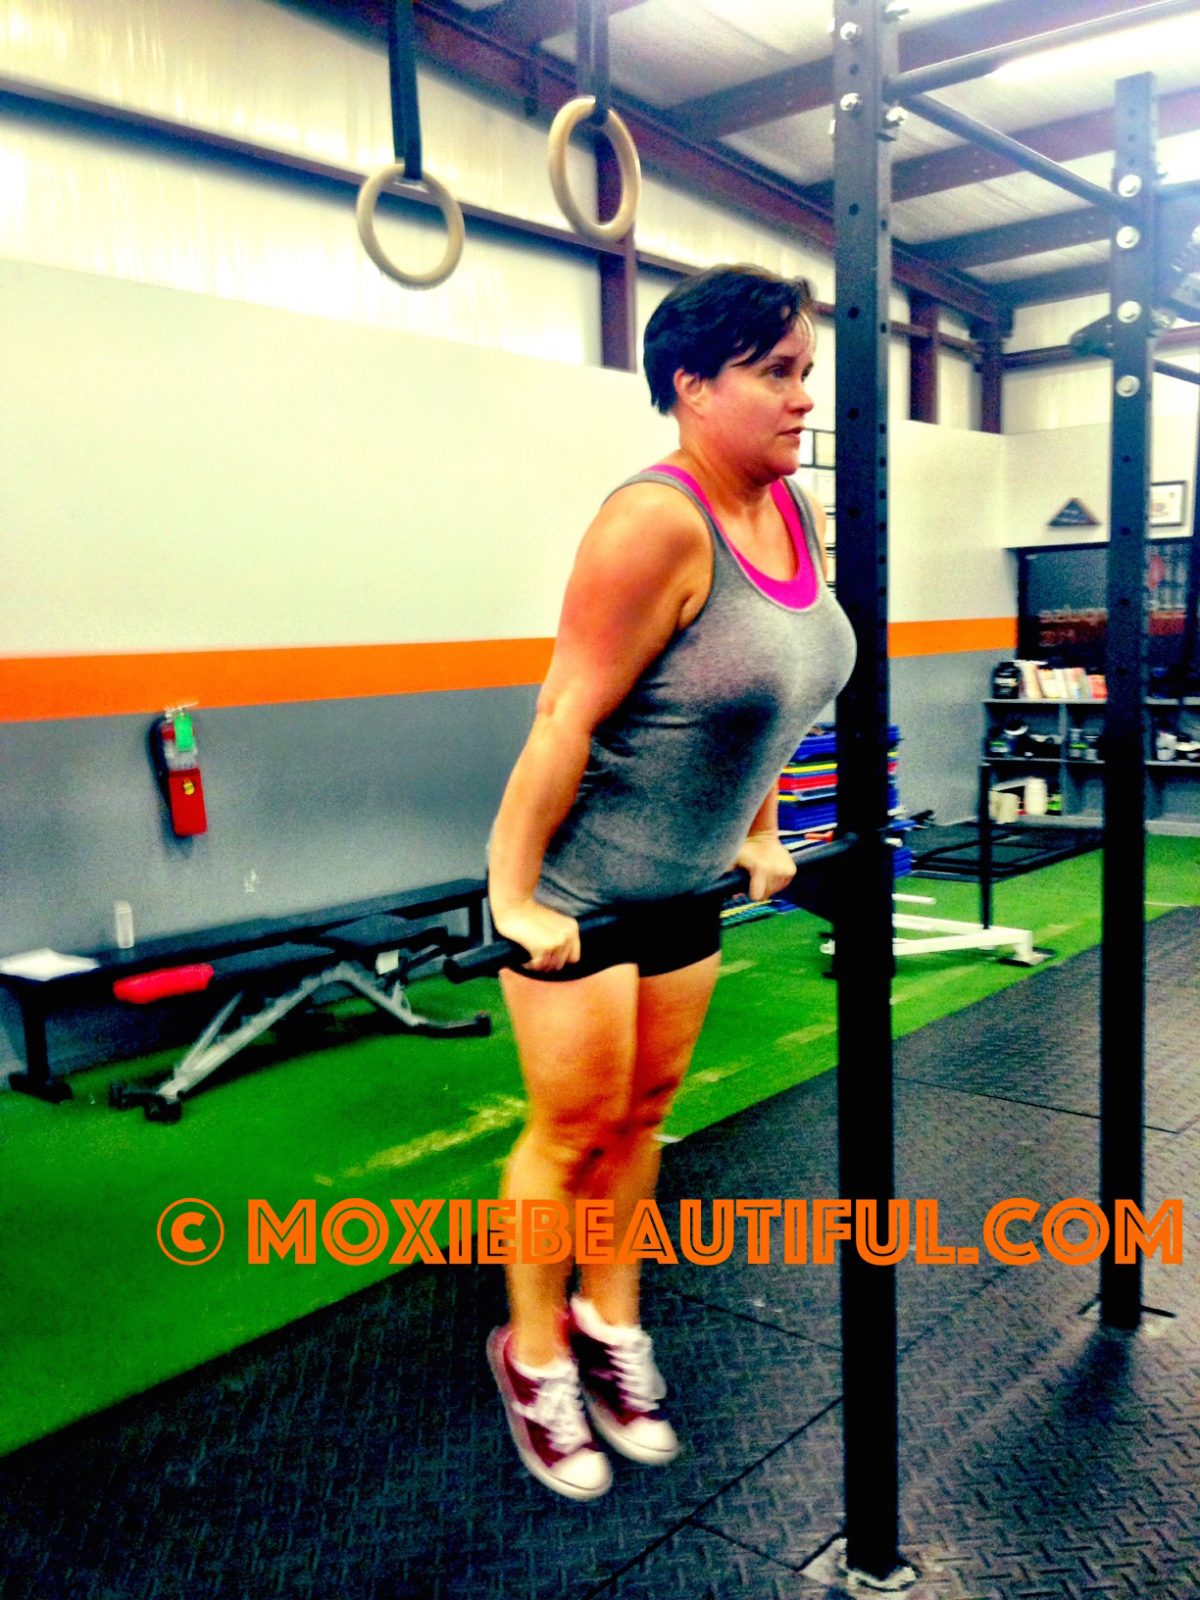 CrossFit WOD Reflection 03.24.15